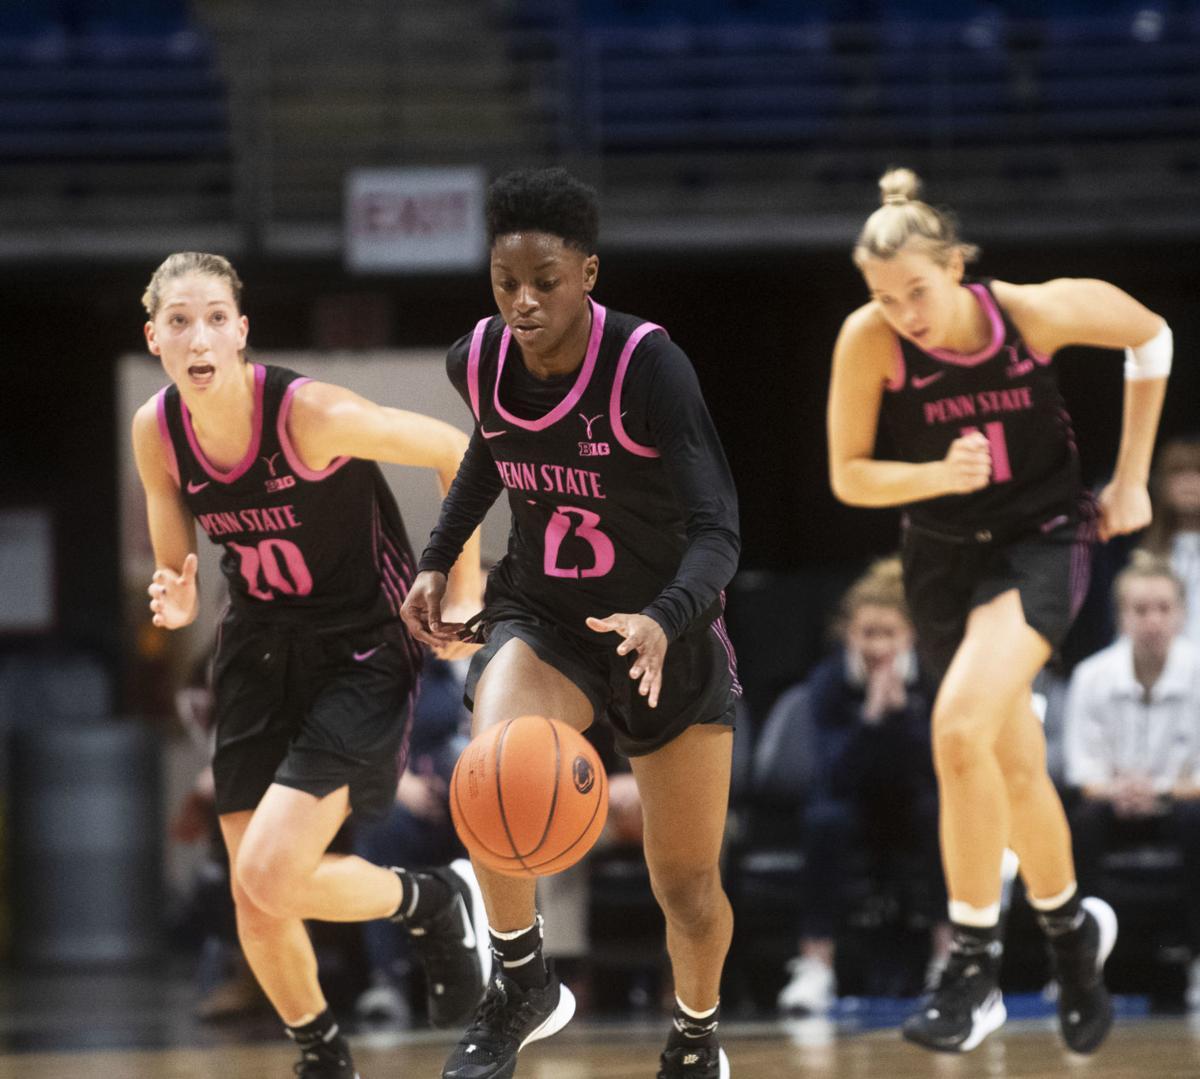 Women's Basketball vs. Clemson, Shay Hagans (23)